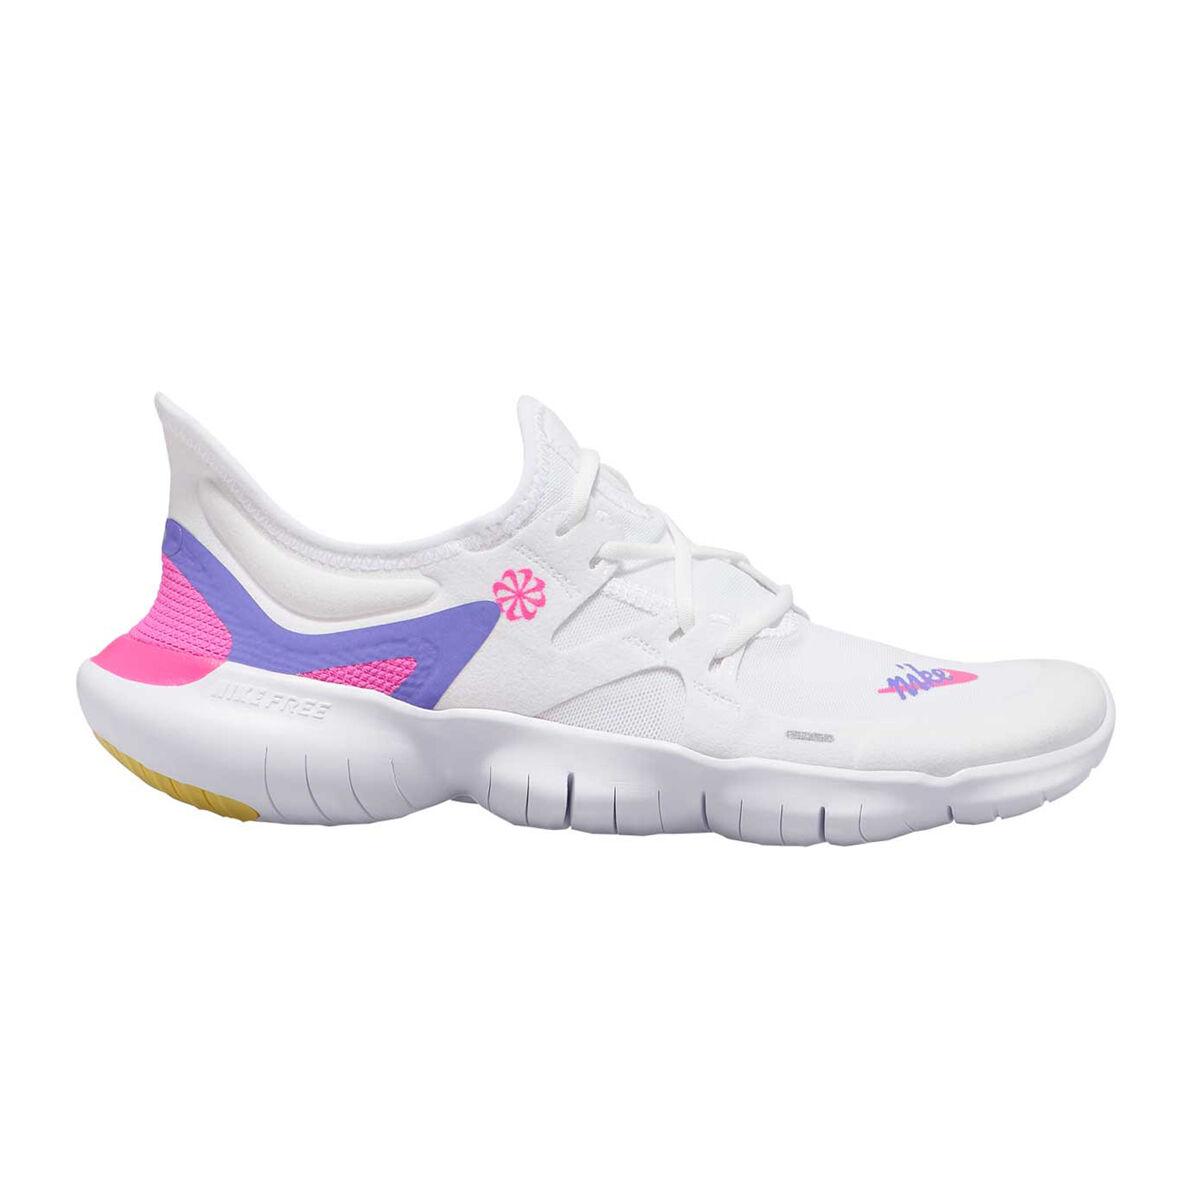 Nike Free RN 5.0 Womens Running Shoes